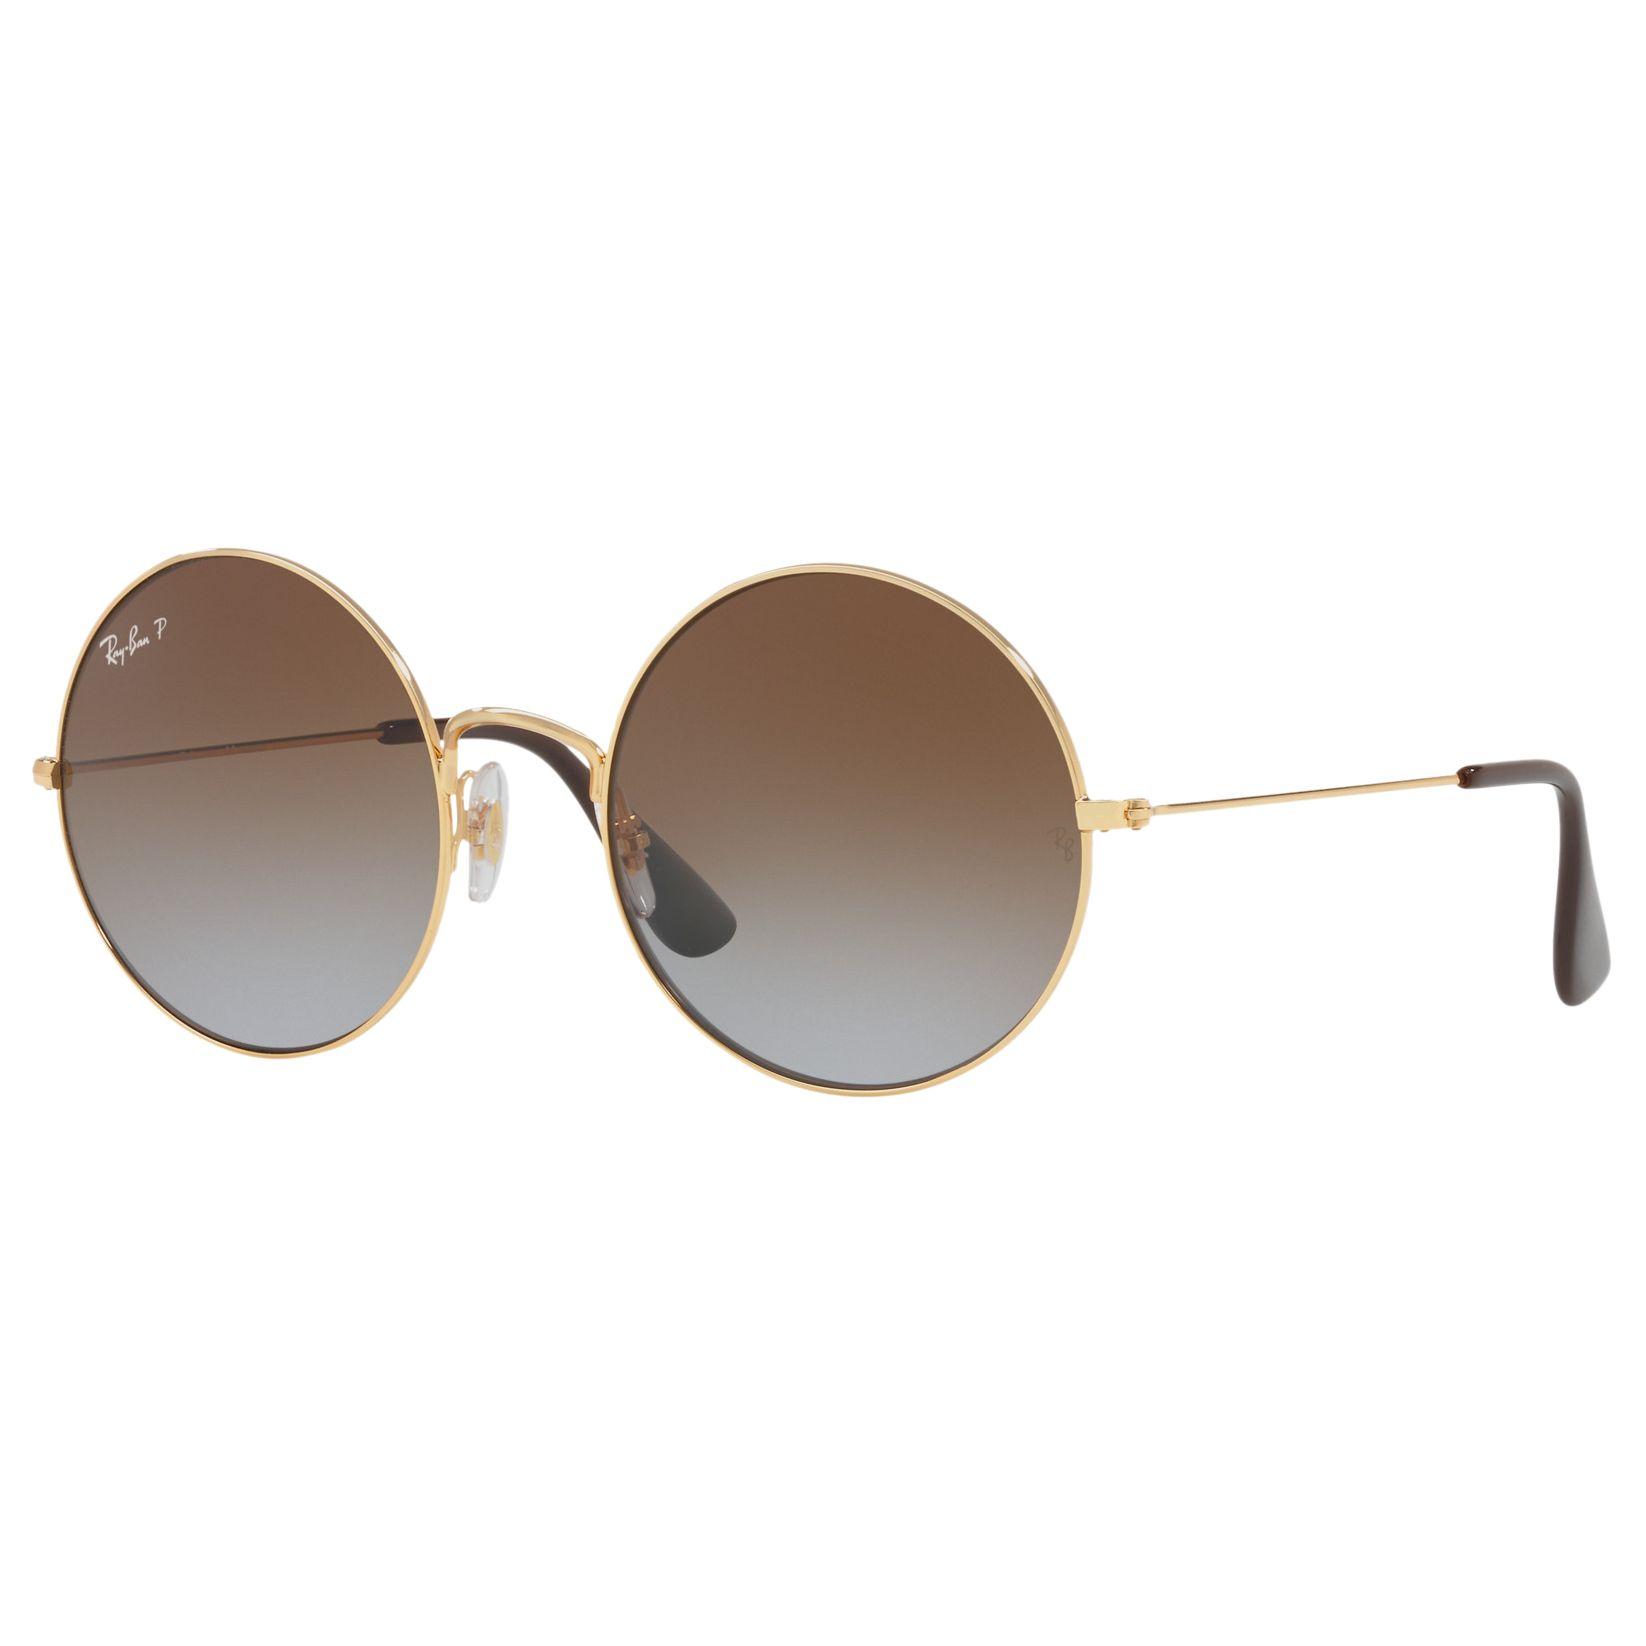 Ray-ban Ray-Ban RB3592 Ja-Jo Polarised Round Sunglasses, Brown